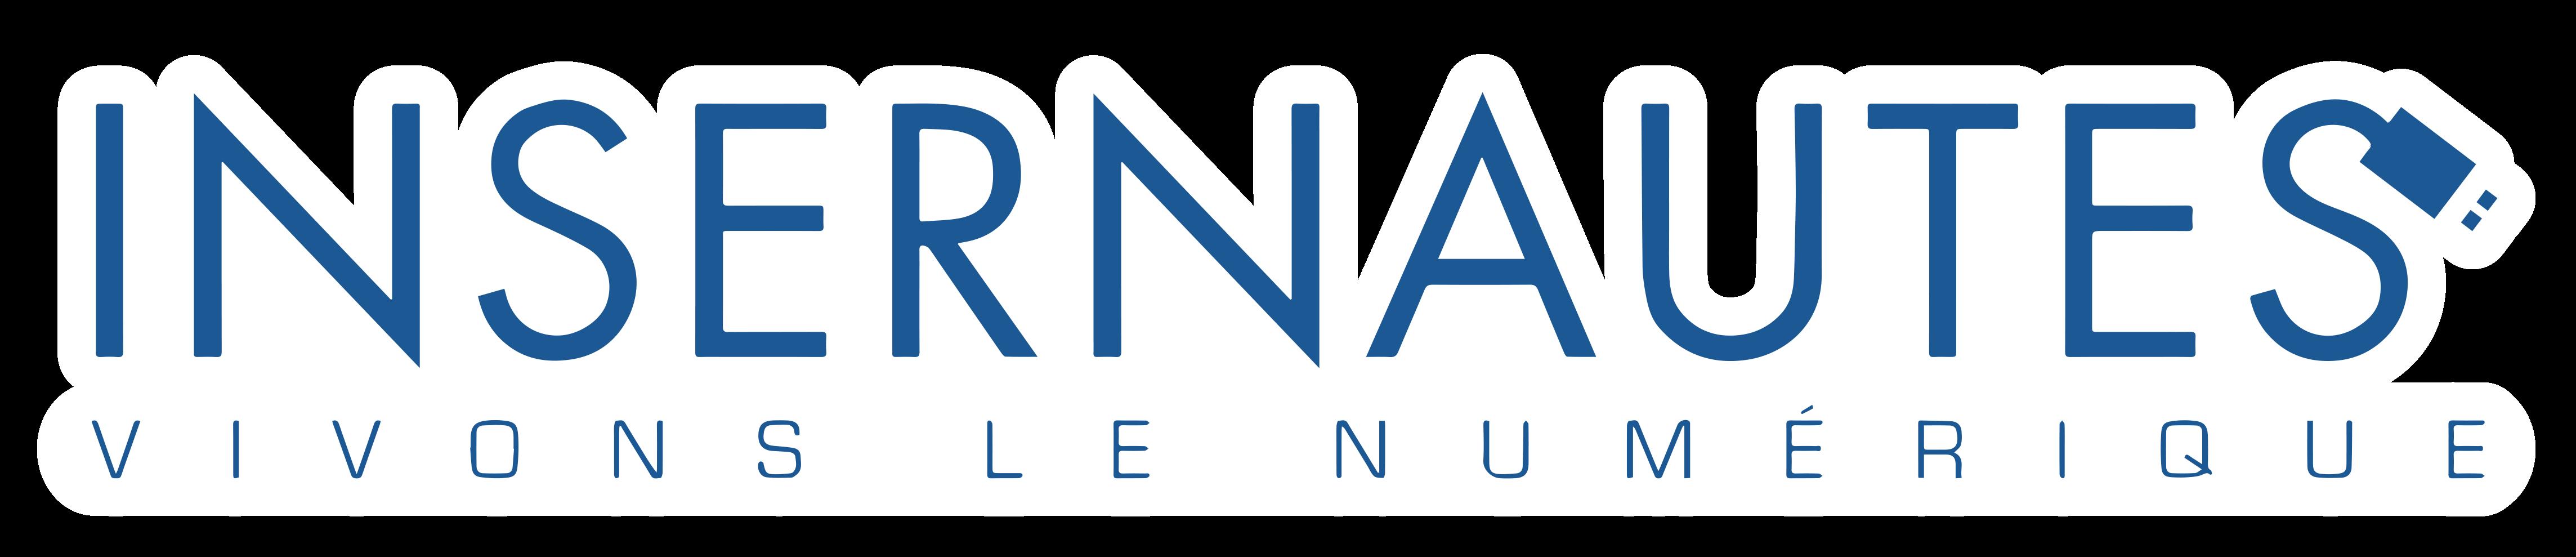 Recherche de prestataires – Média Radio – INSERNAUTES – TRAVAIL ENTRAIDE